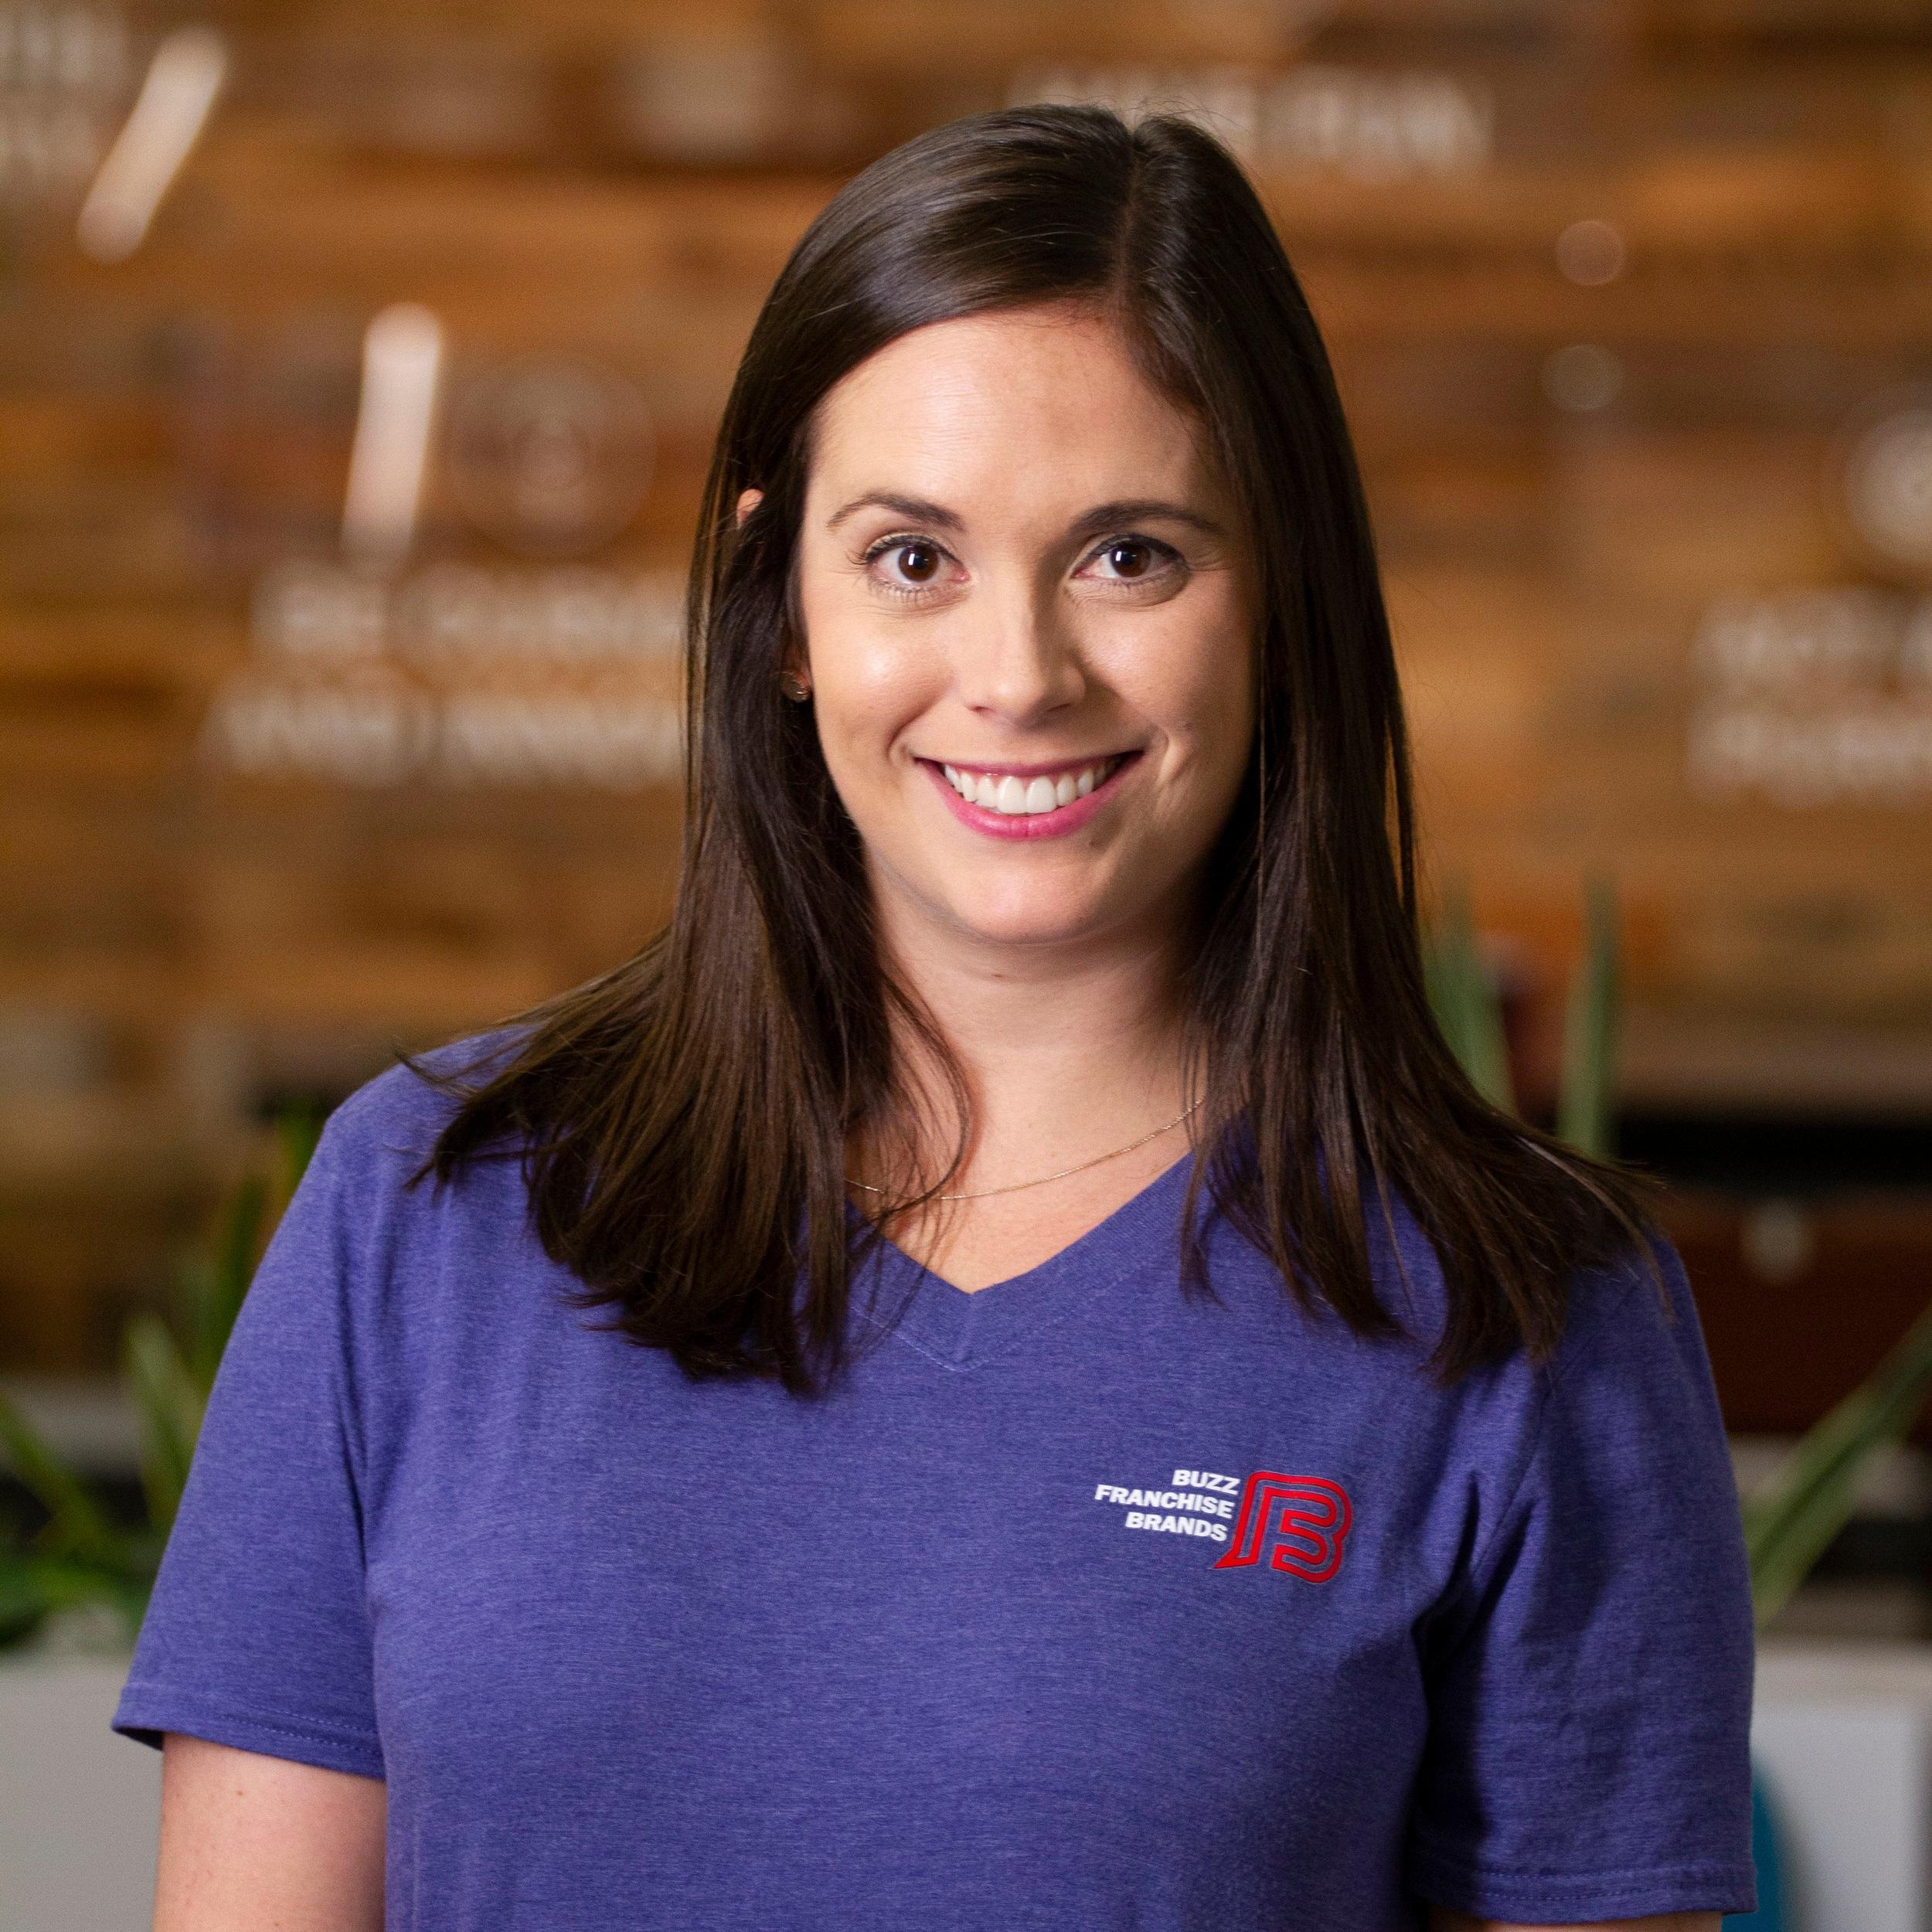 Bridget Cardillo, Director of Digital Marketing